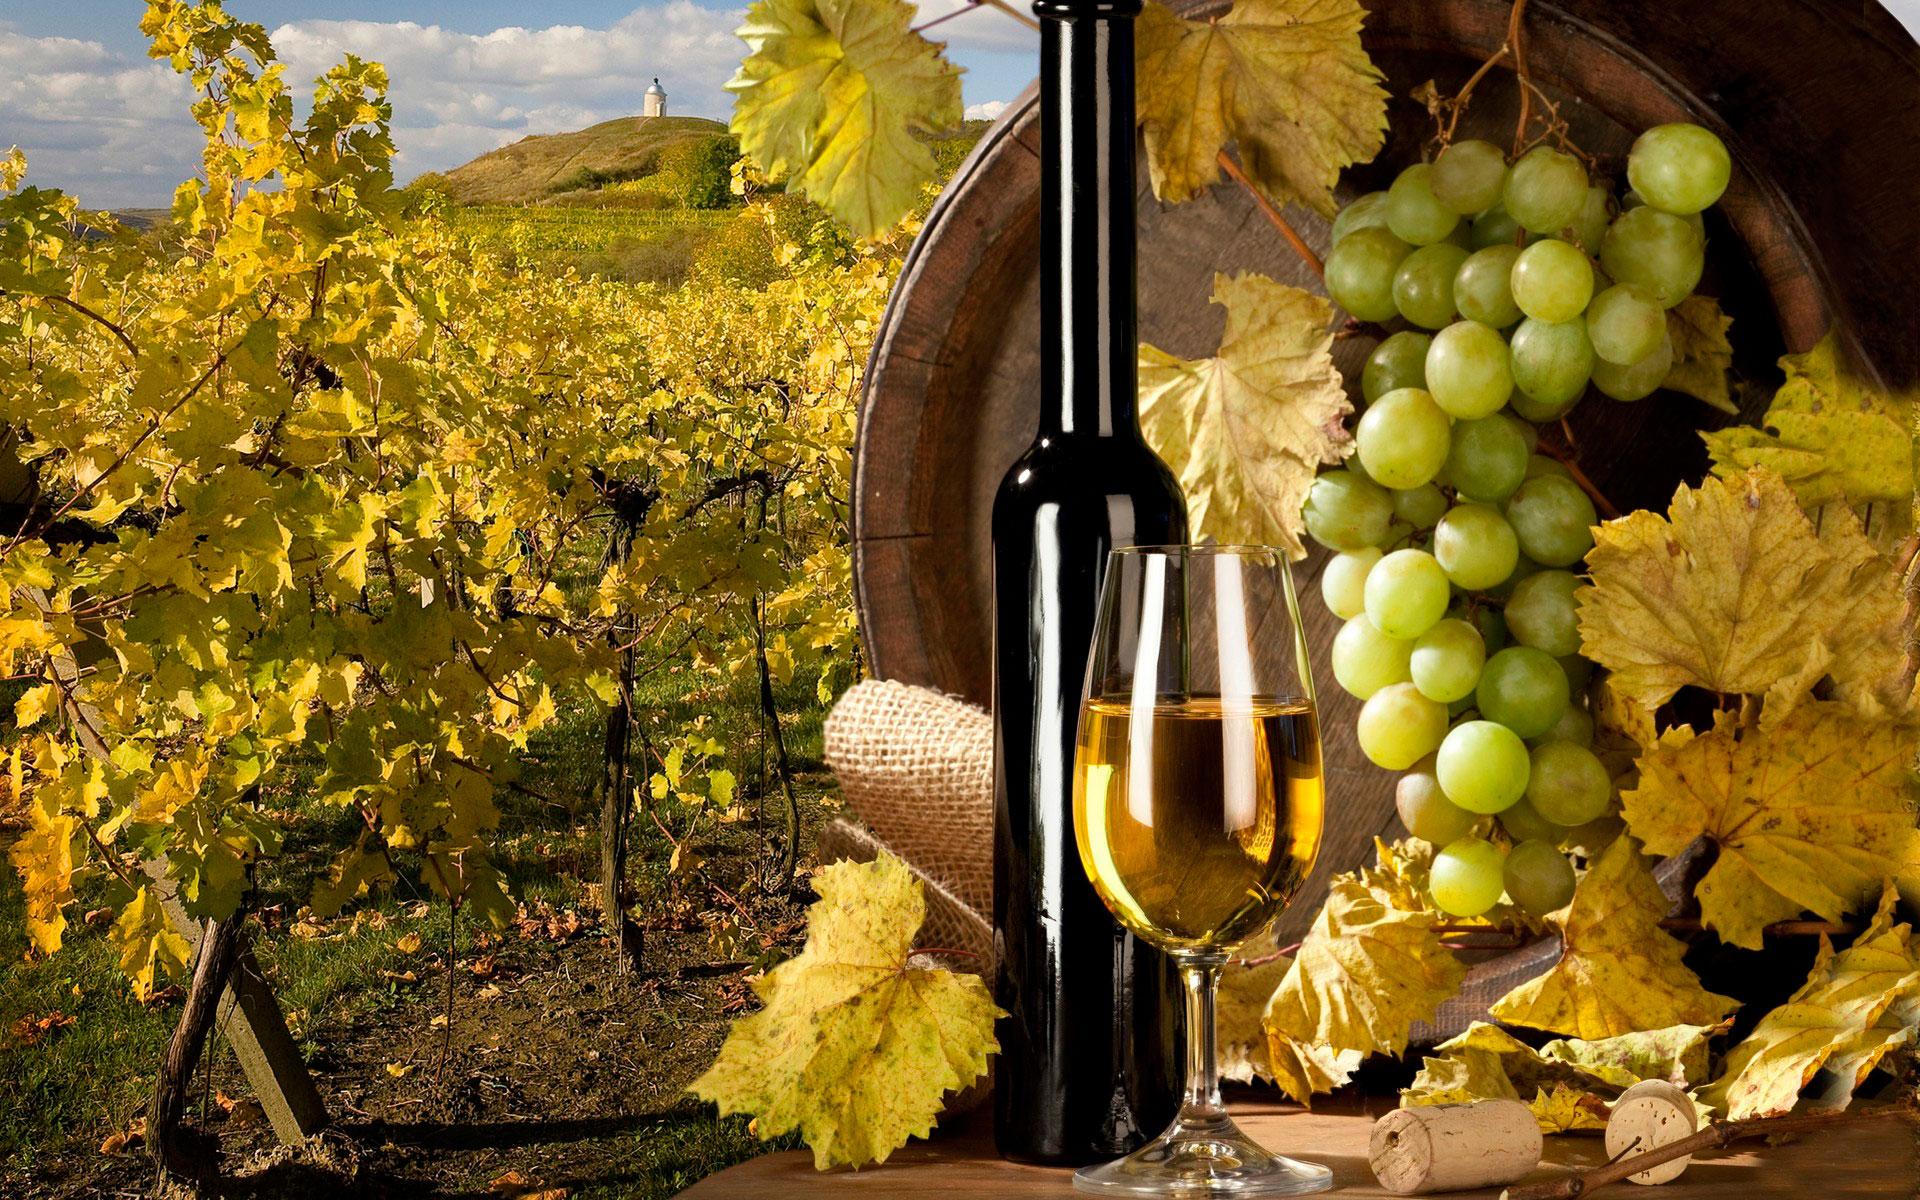 Бизнес на выращивании винограда